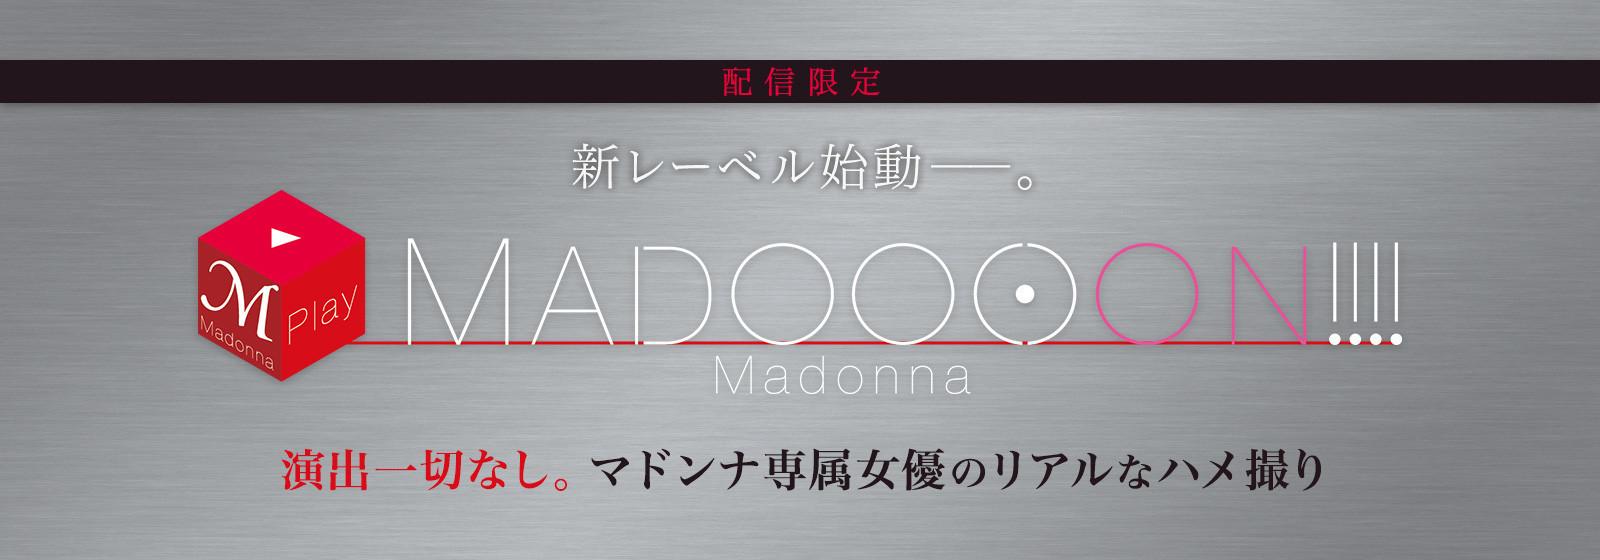 MDON-00001参与麦当娜全新内容小组制作的爱弓りょう(爱弓凉)用完全燃烧的方式肉搏 (4)